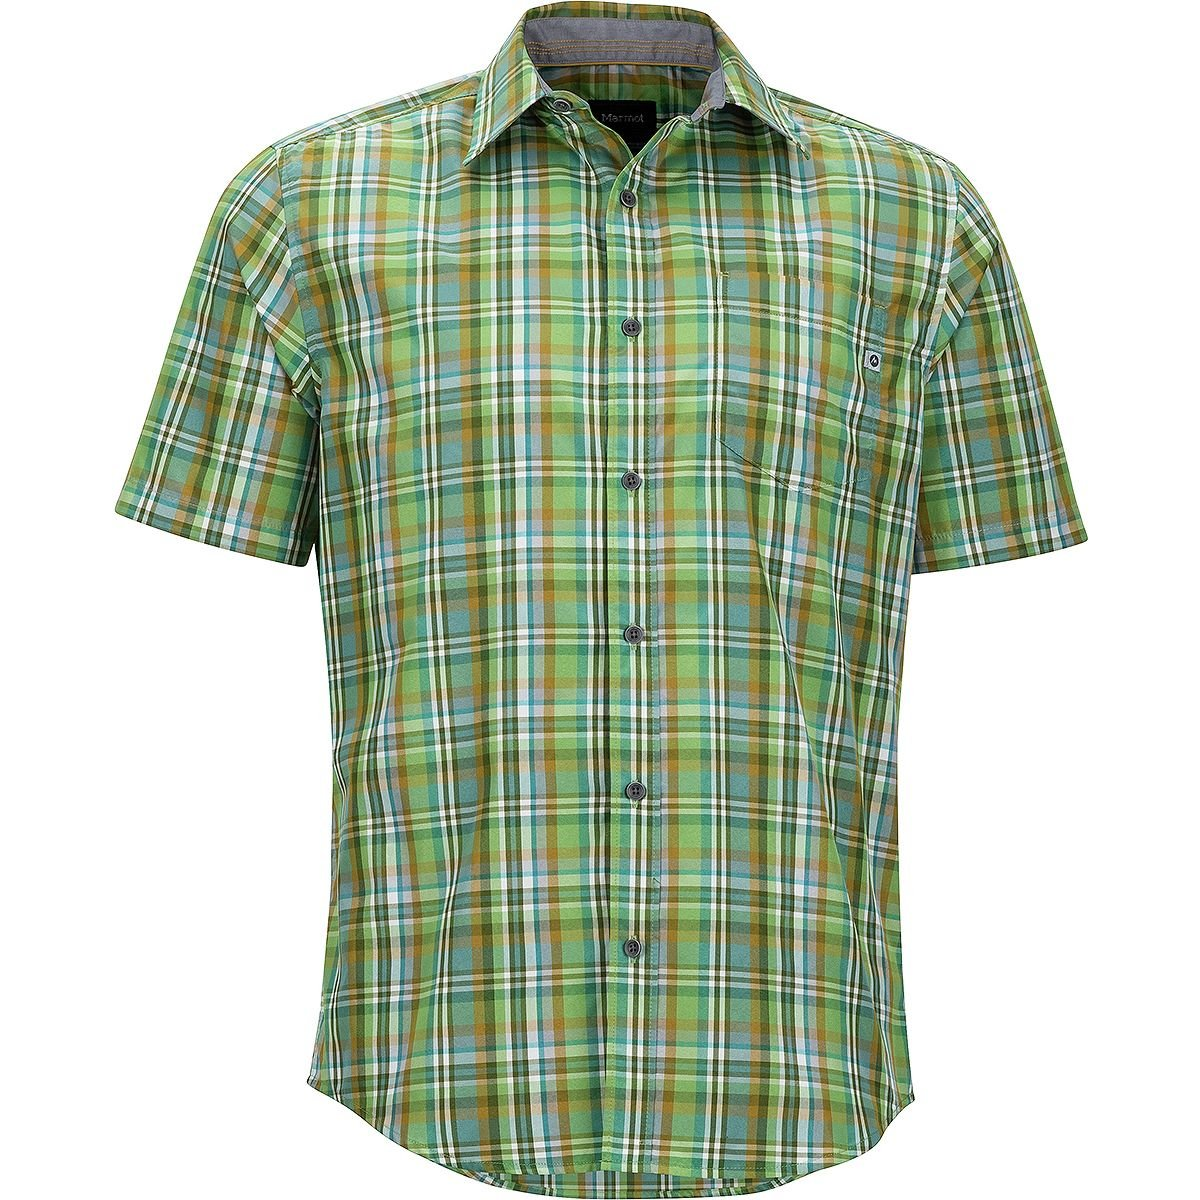 Marmot Dobson Shirt – Men 's Wheatgrass、L   B07B4X5RNP